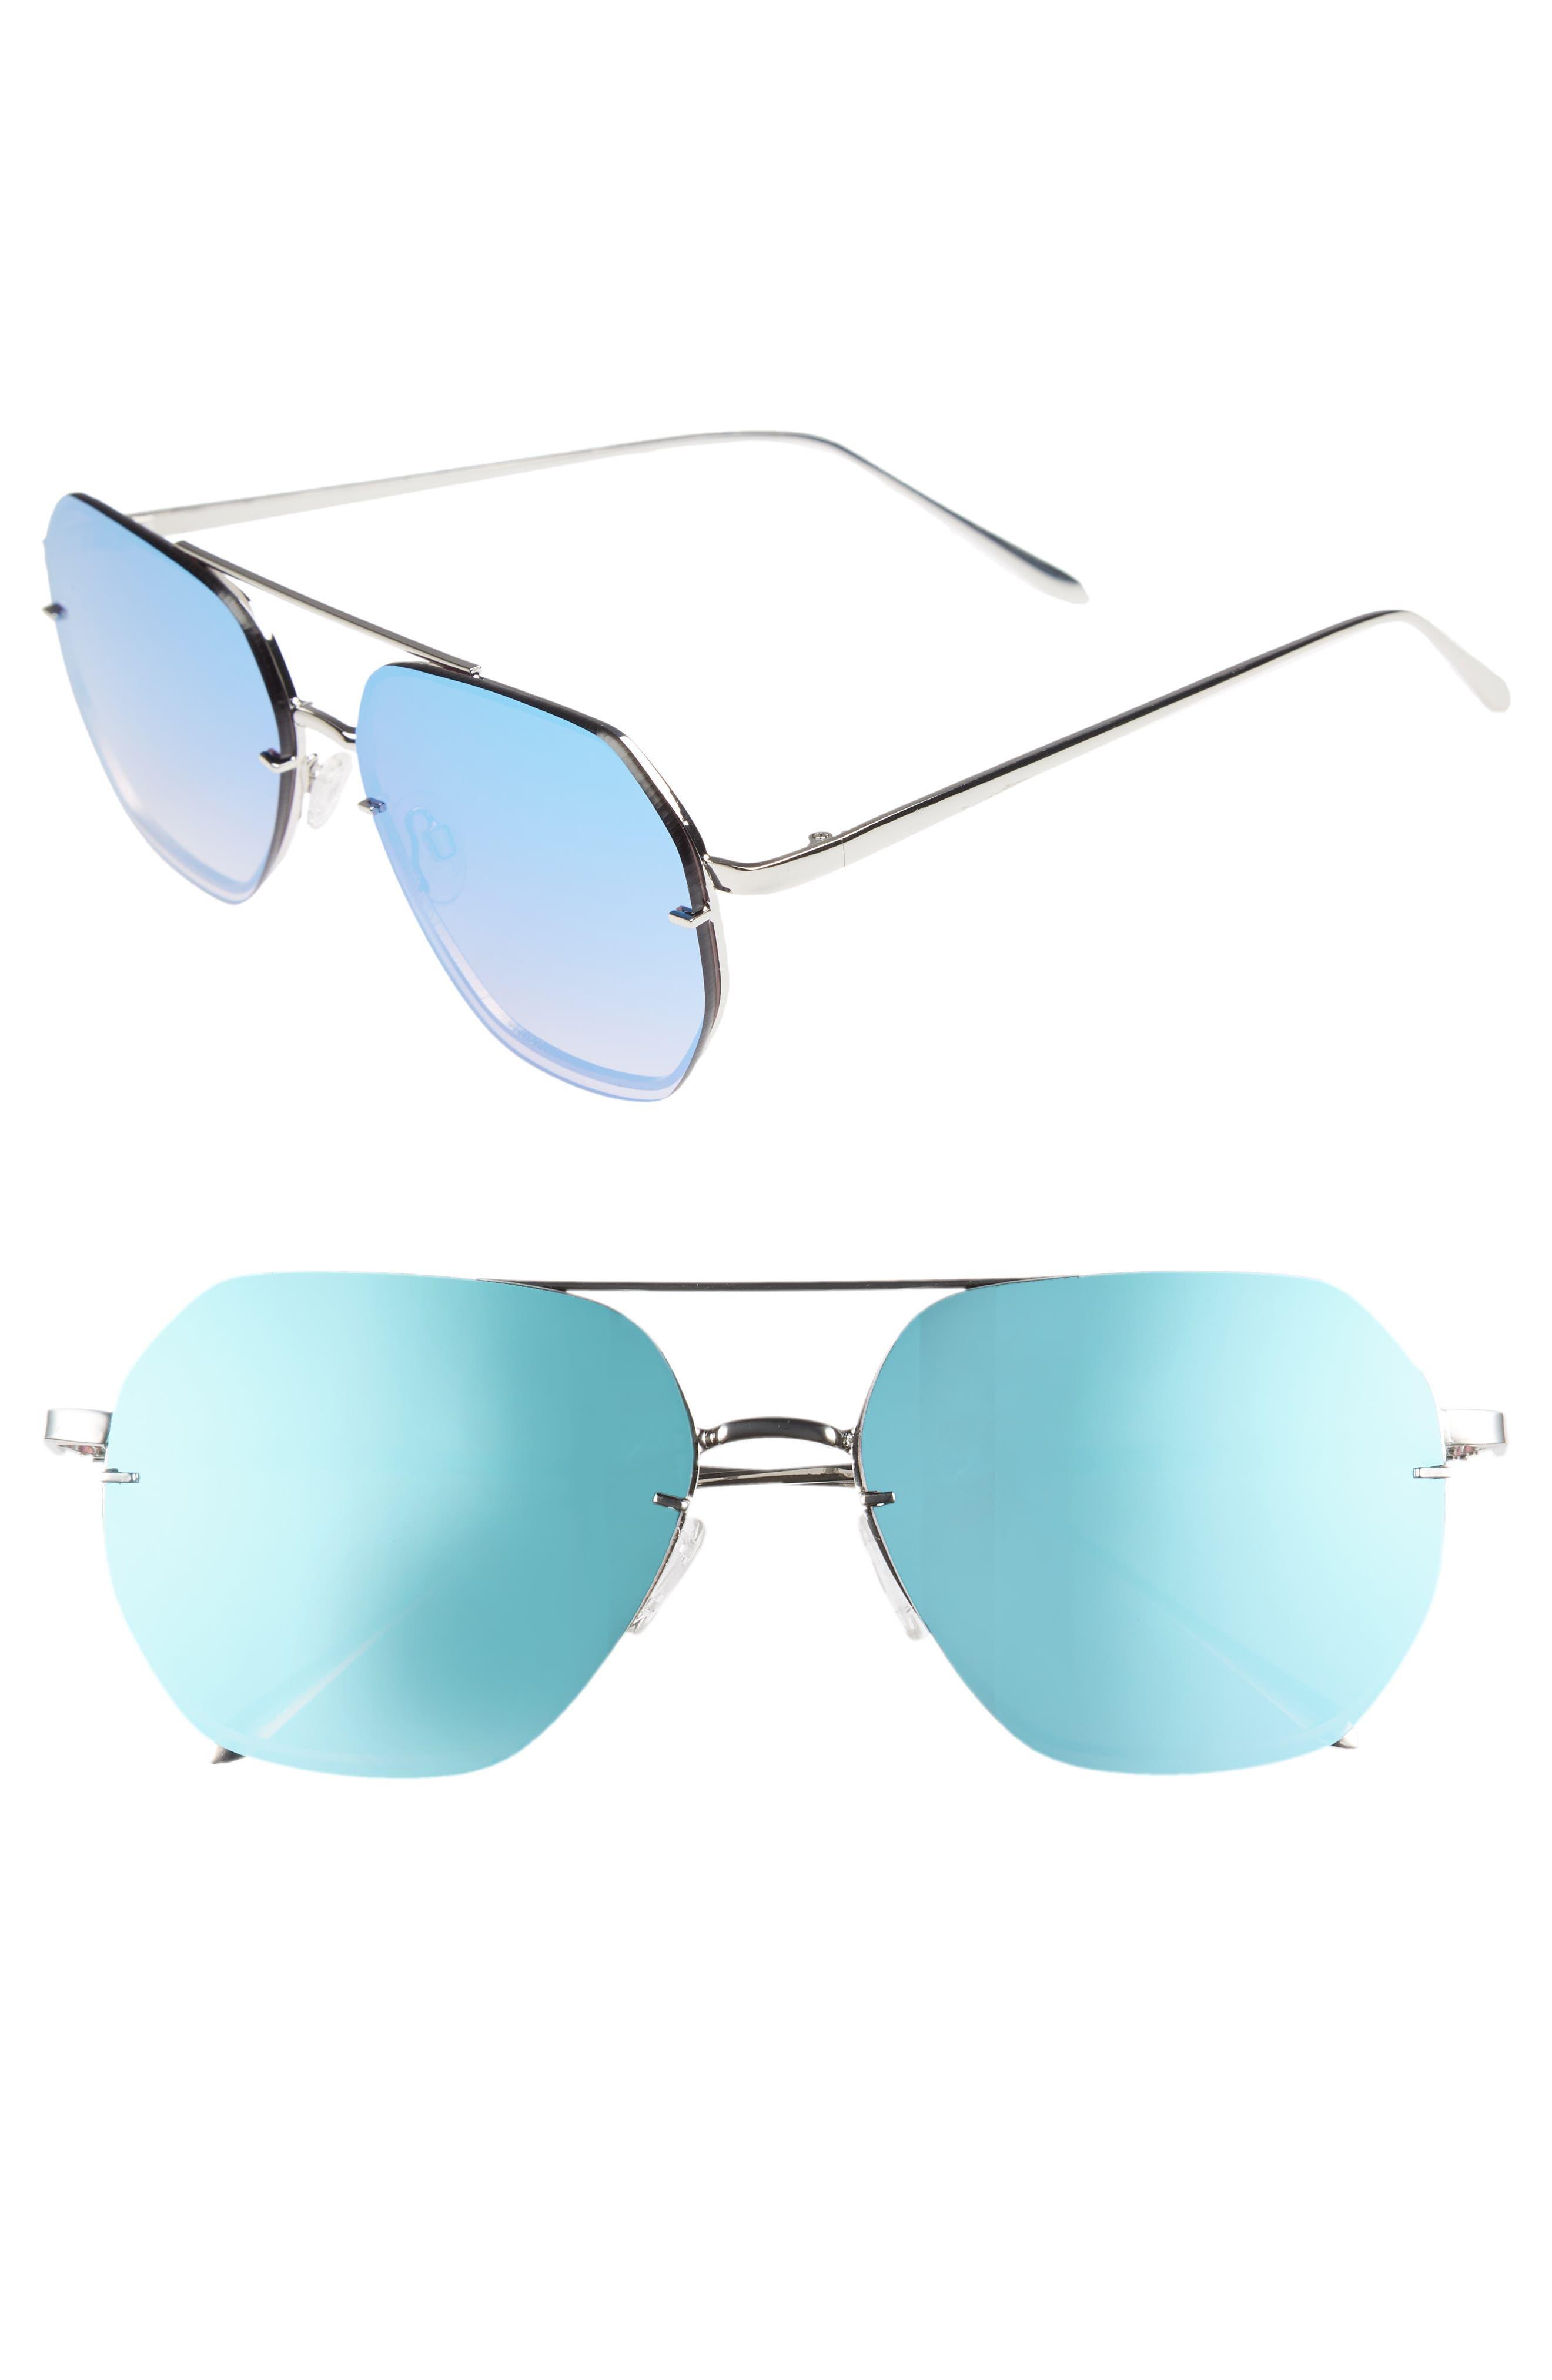 62mm Metal Flat Geo Aviator Sunglasses,                         Main,                         color, Silver/ Blue